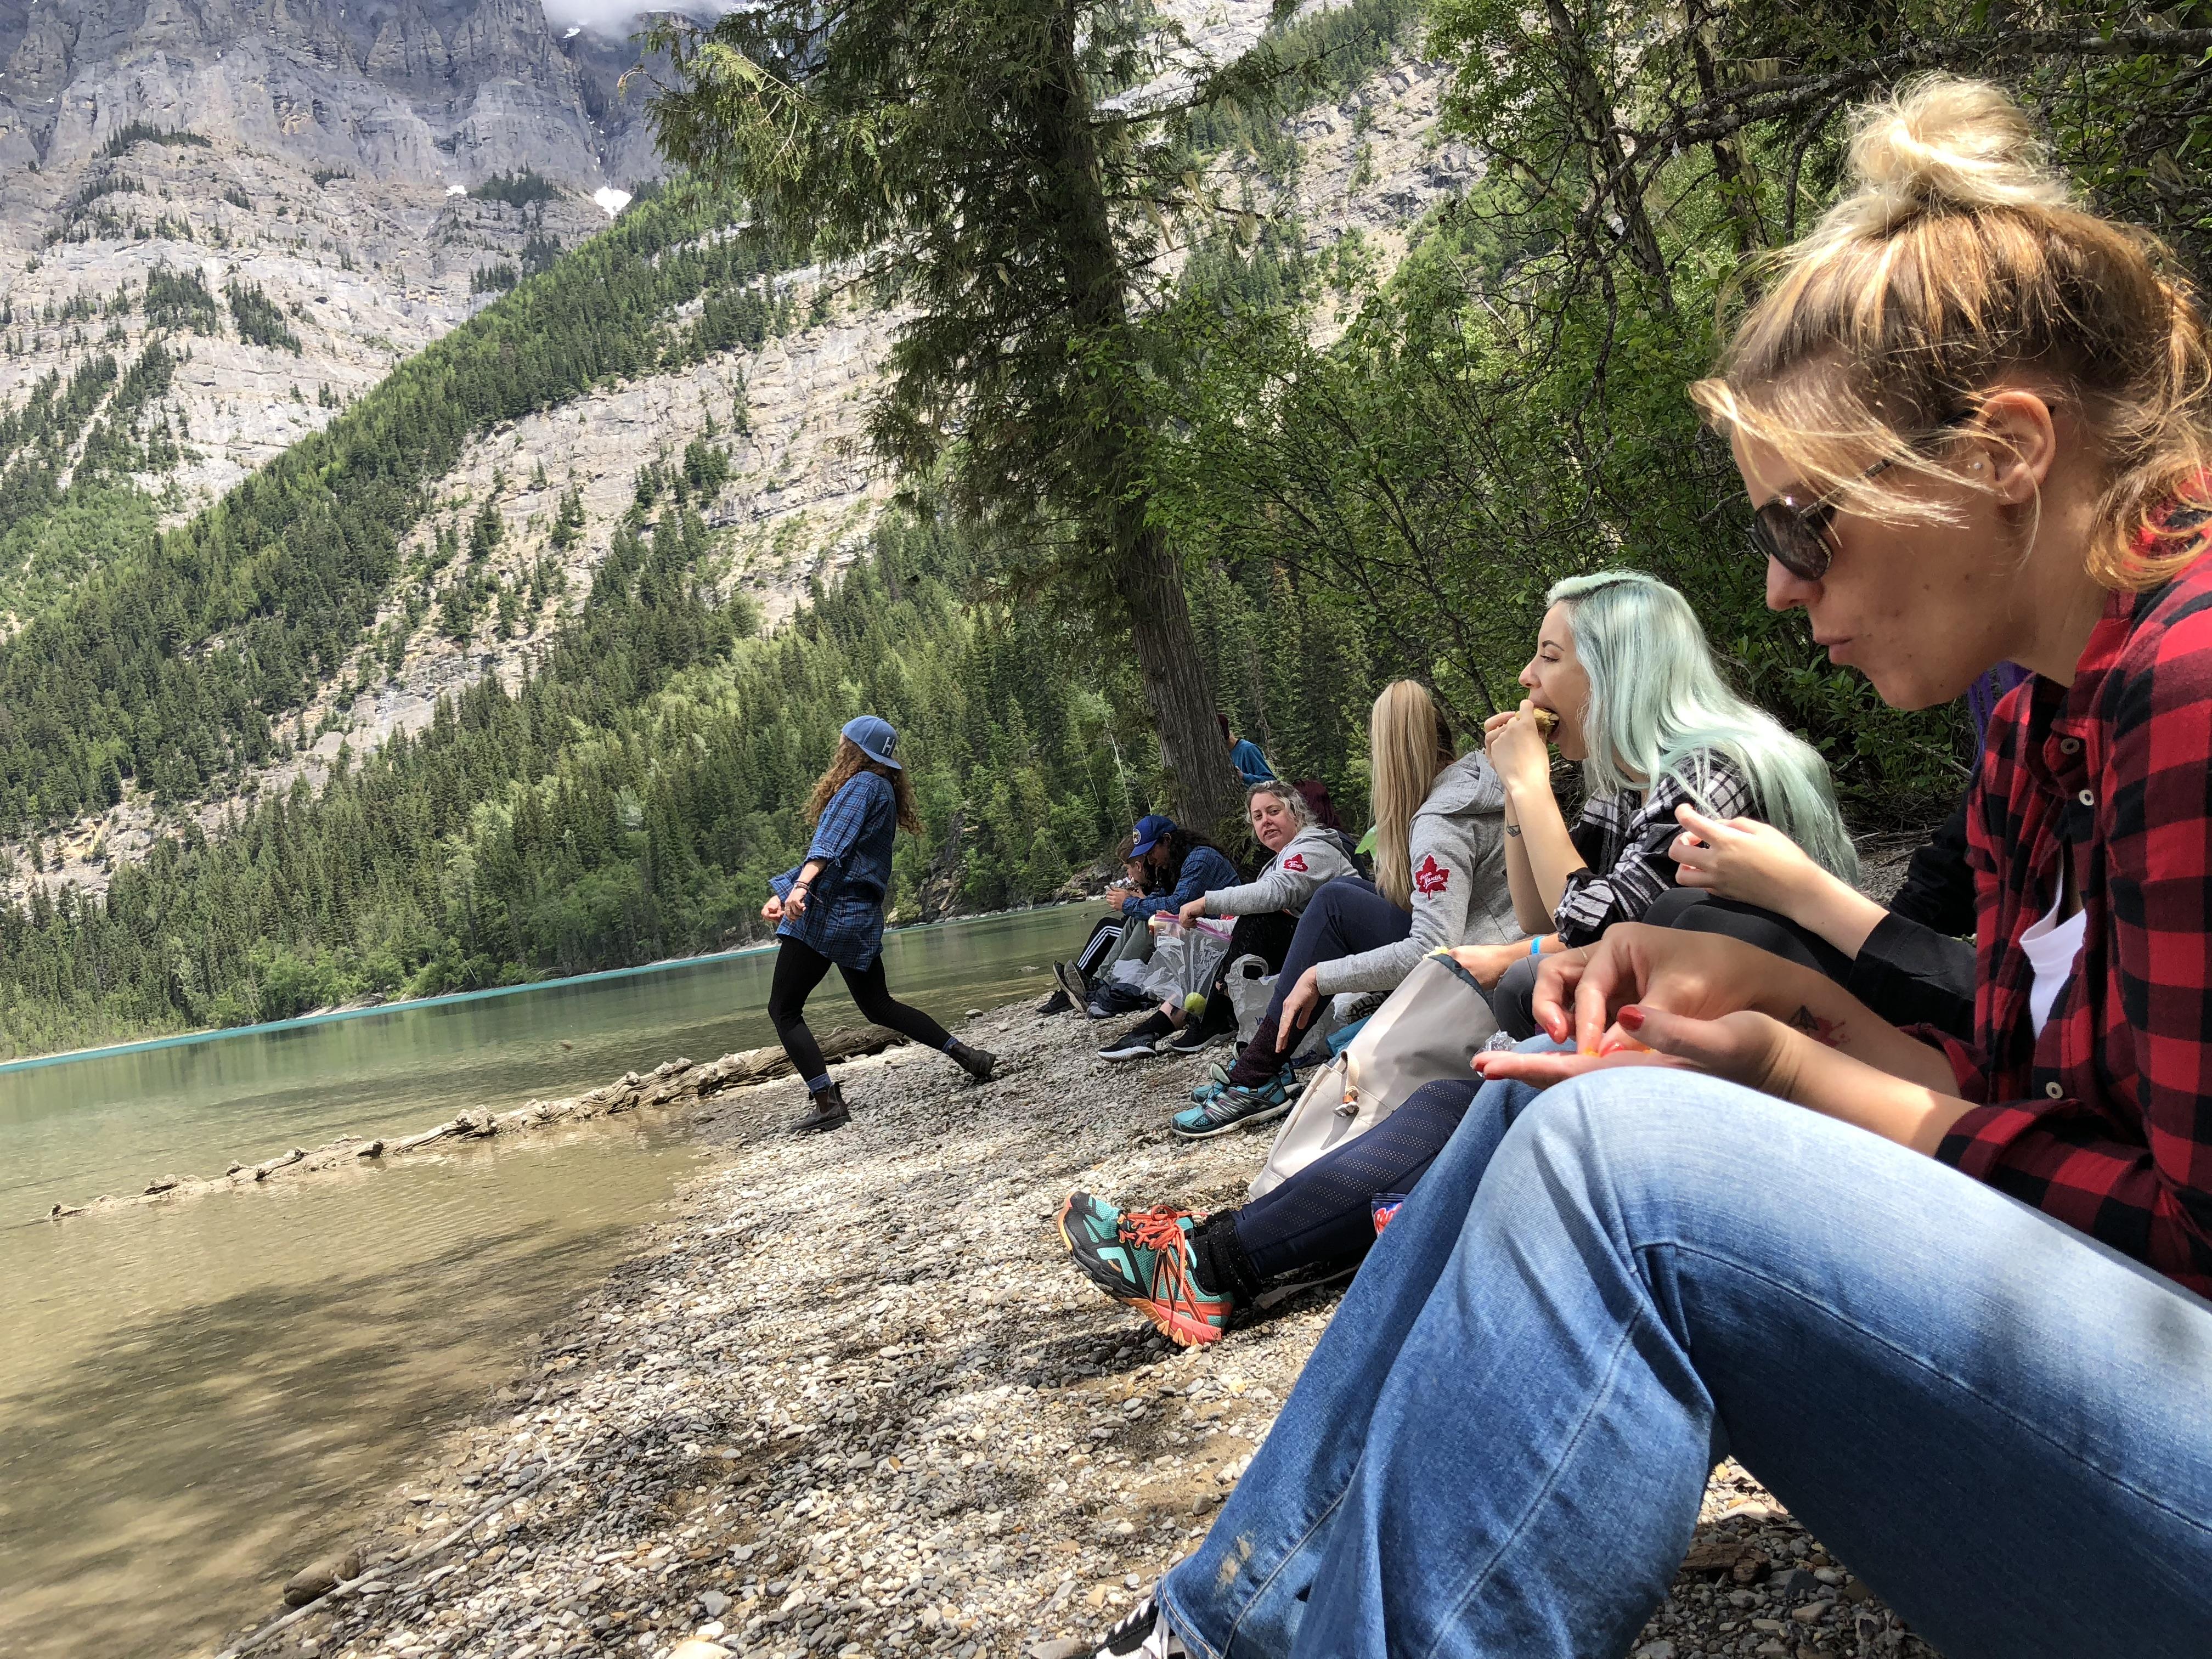 Canada Rockies TrekAmerica Itrekhere 2018 373